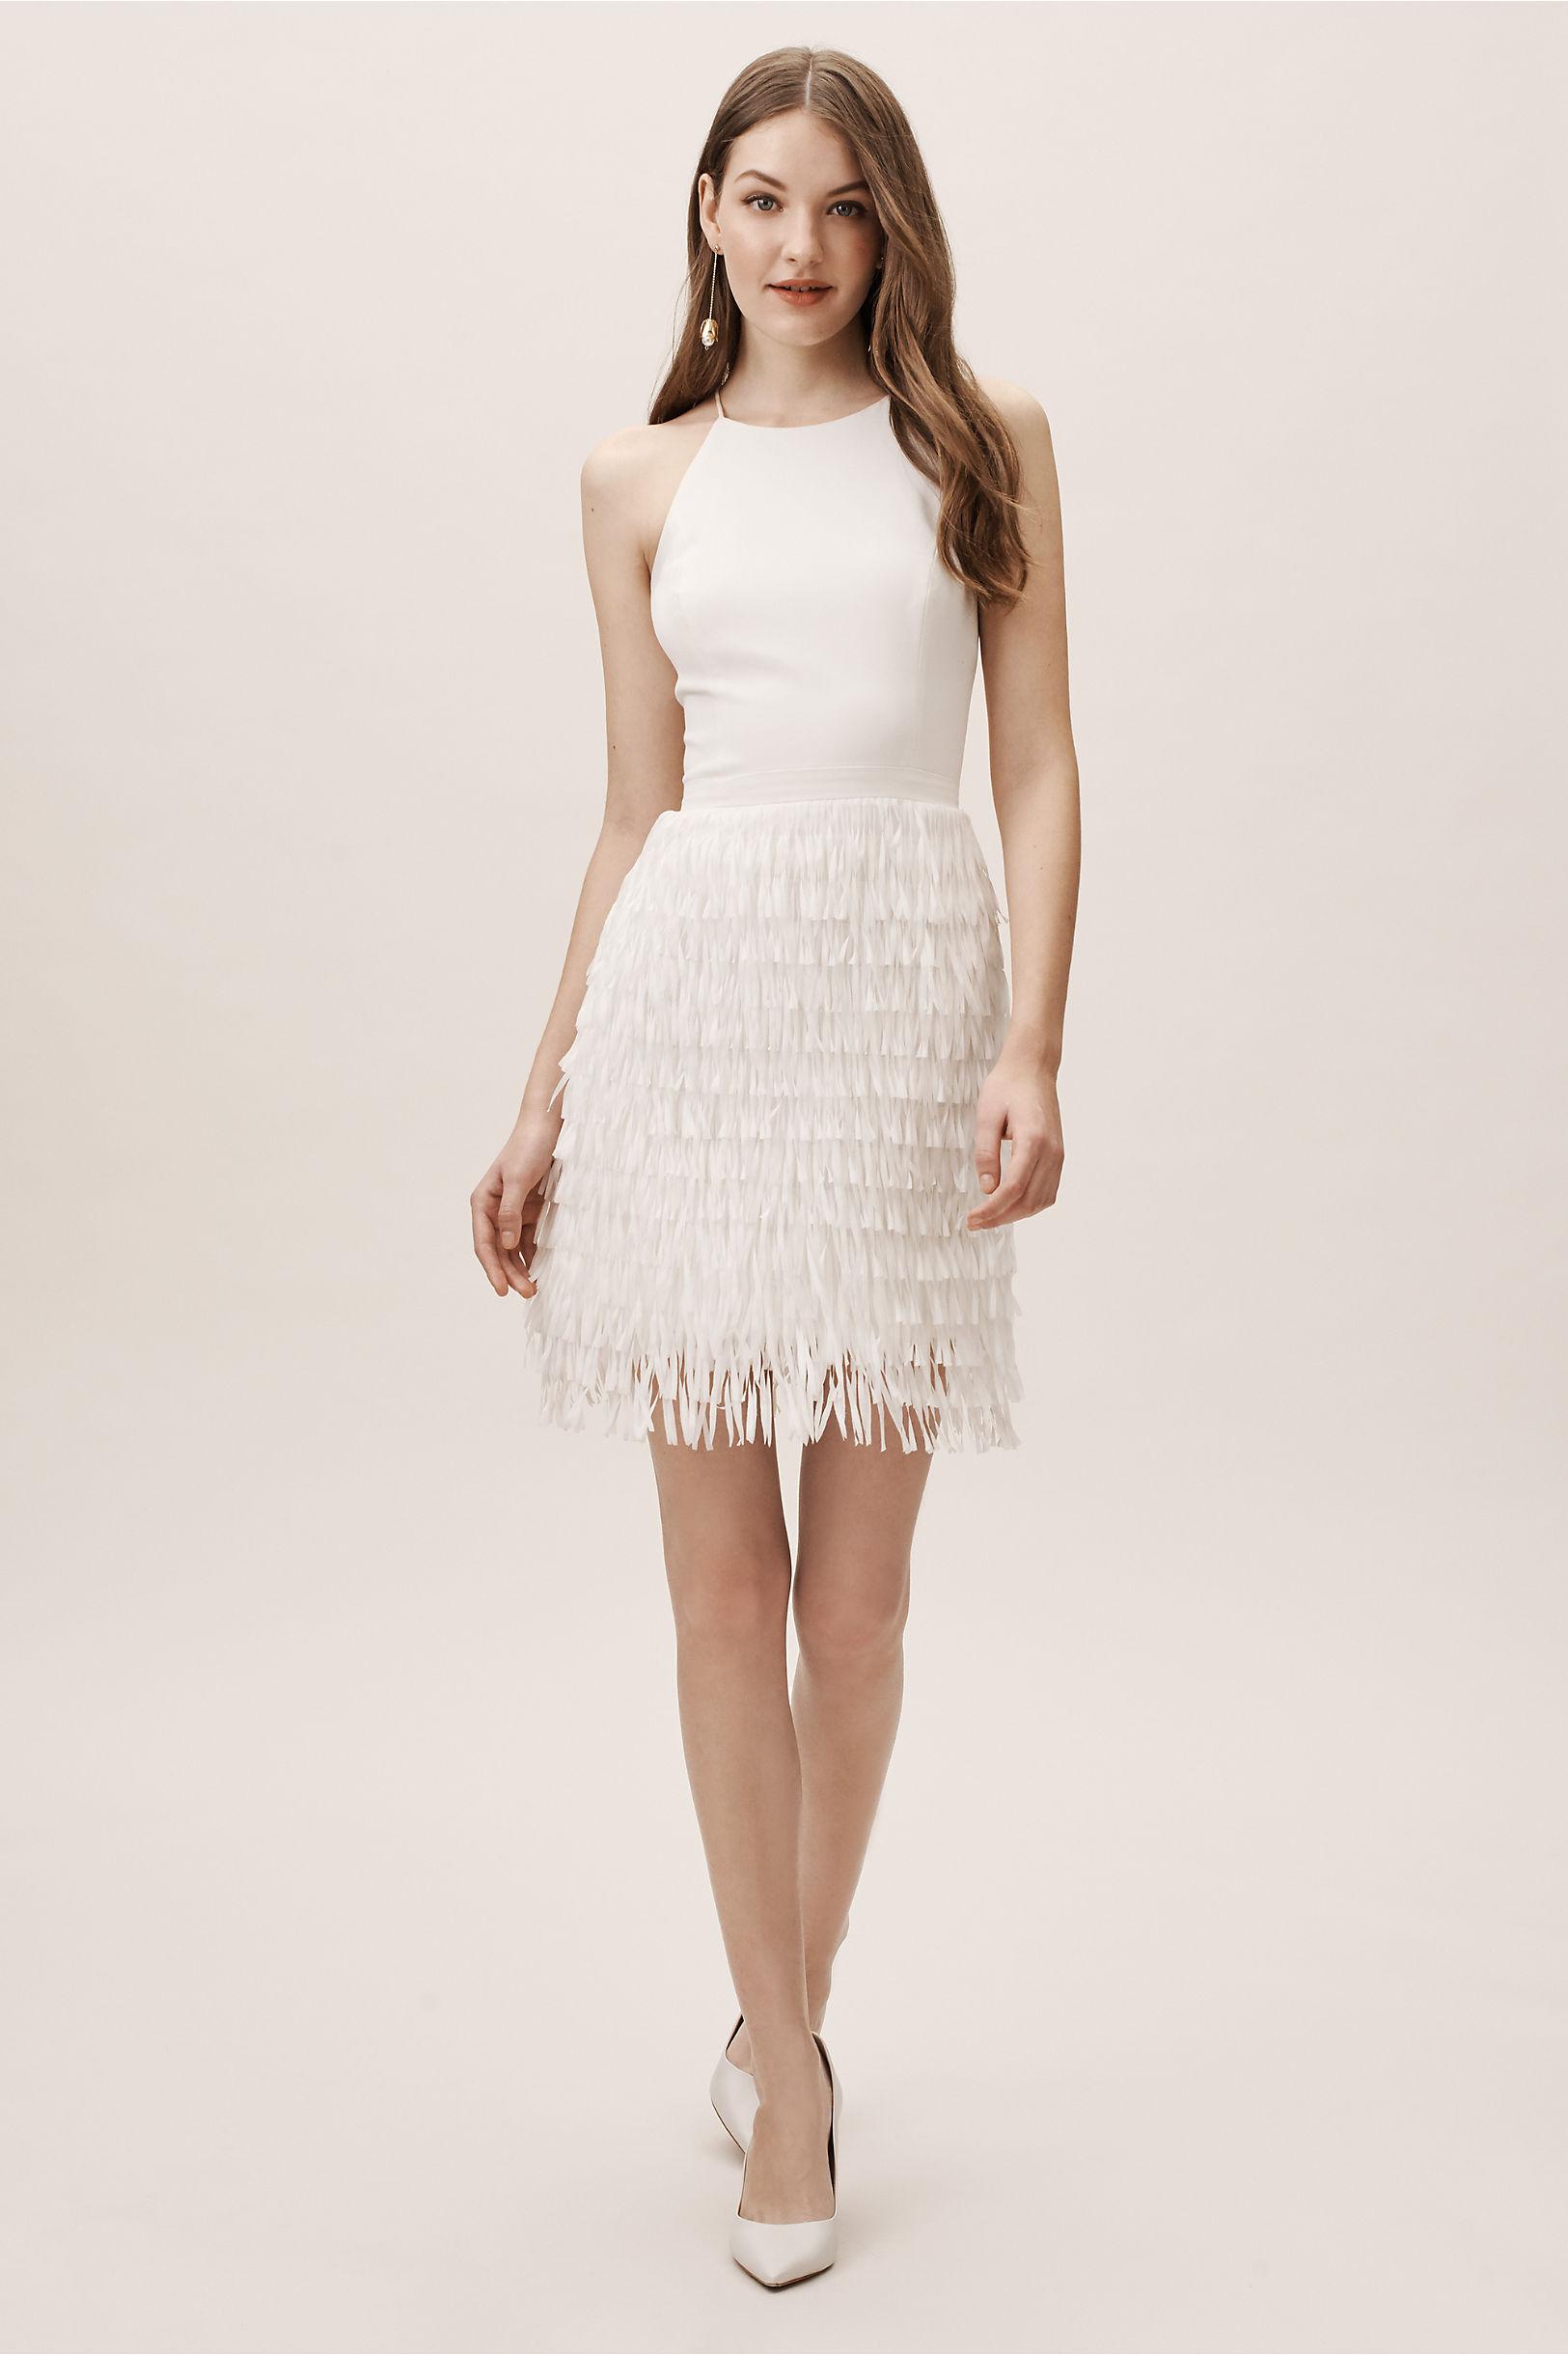 Promenade dress ivory in bride bhldn ivory promenade dress bhldn junglespirit Images